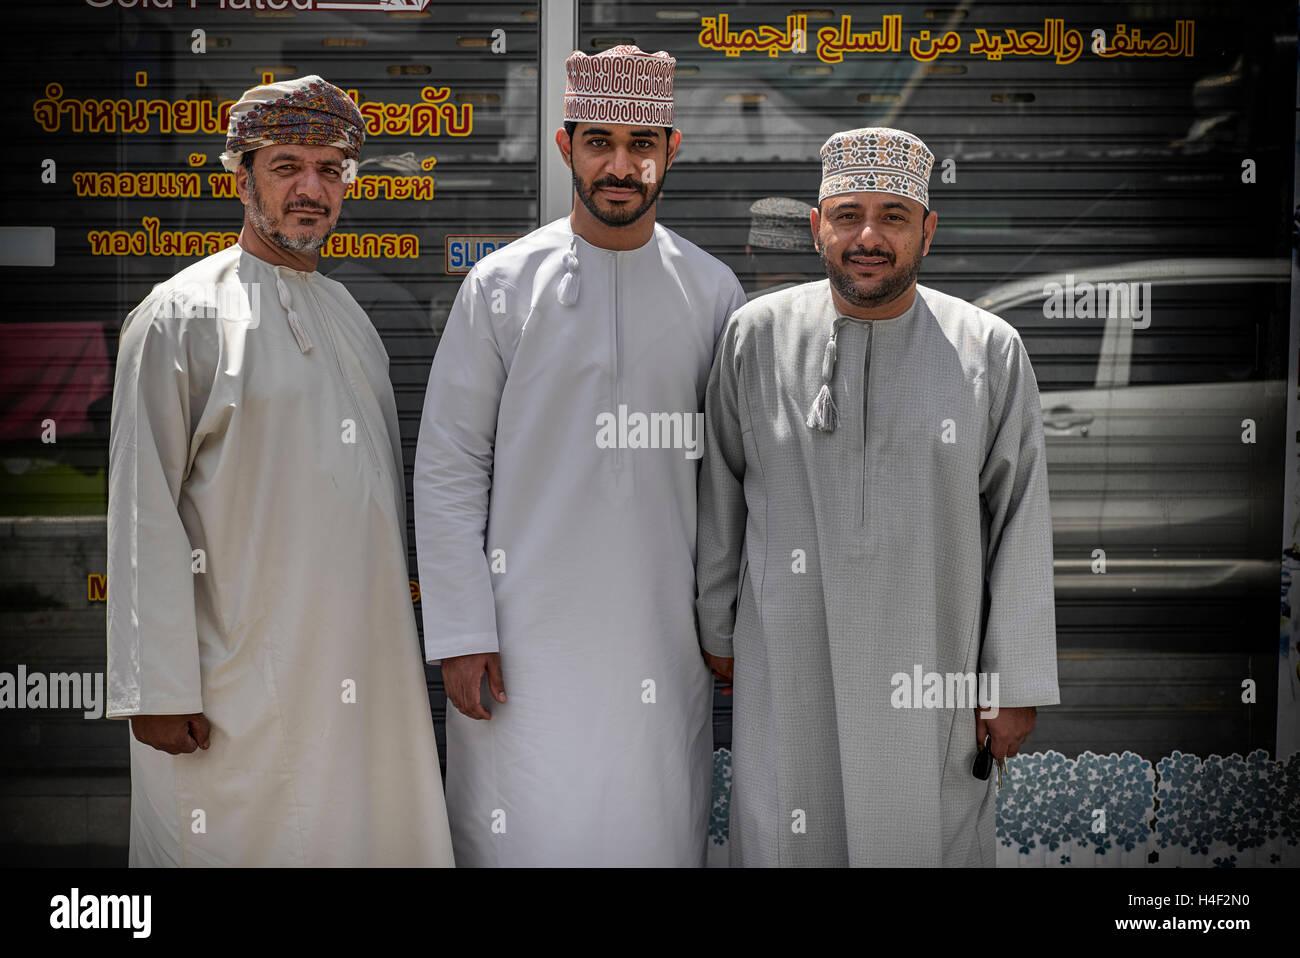 Dishdasha Stock Photos & Dishdasha Stock Images - Alamy